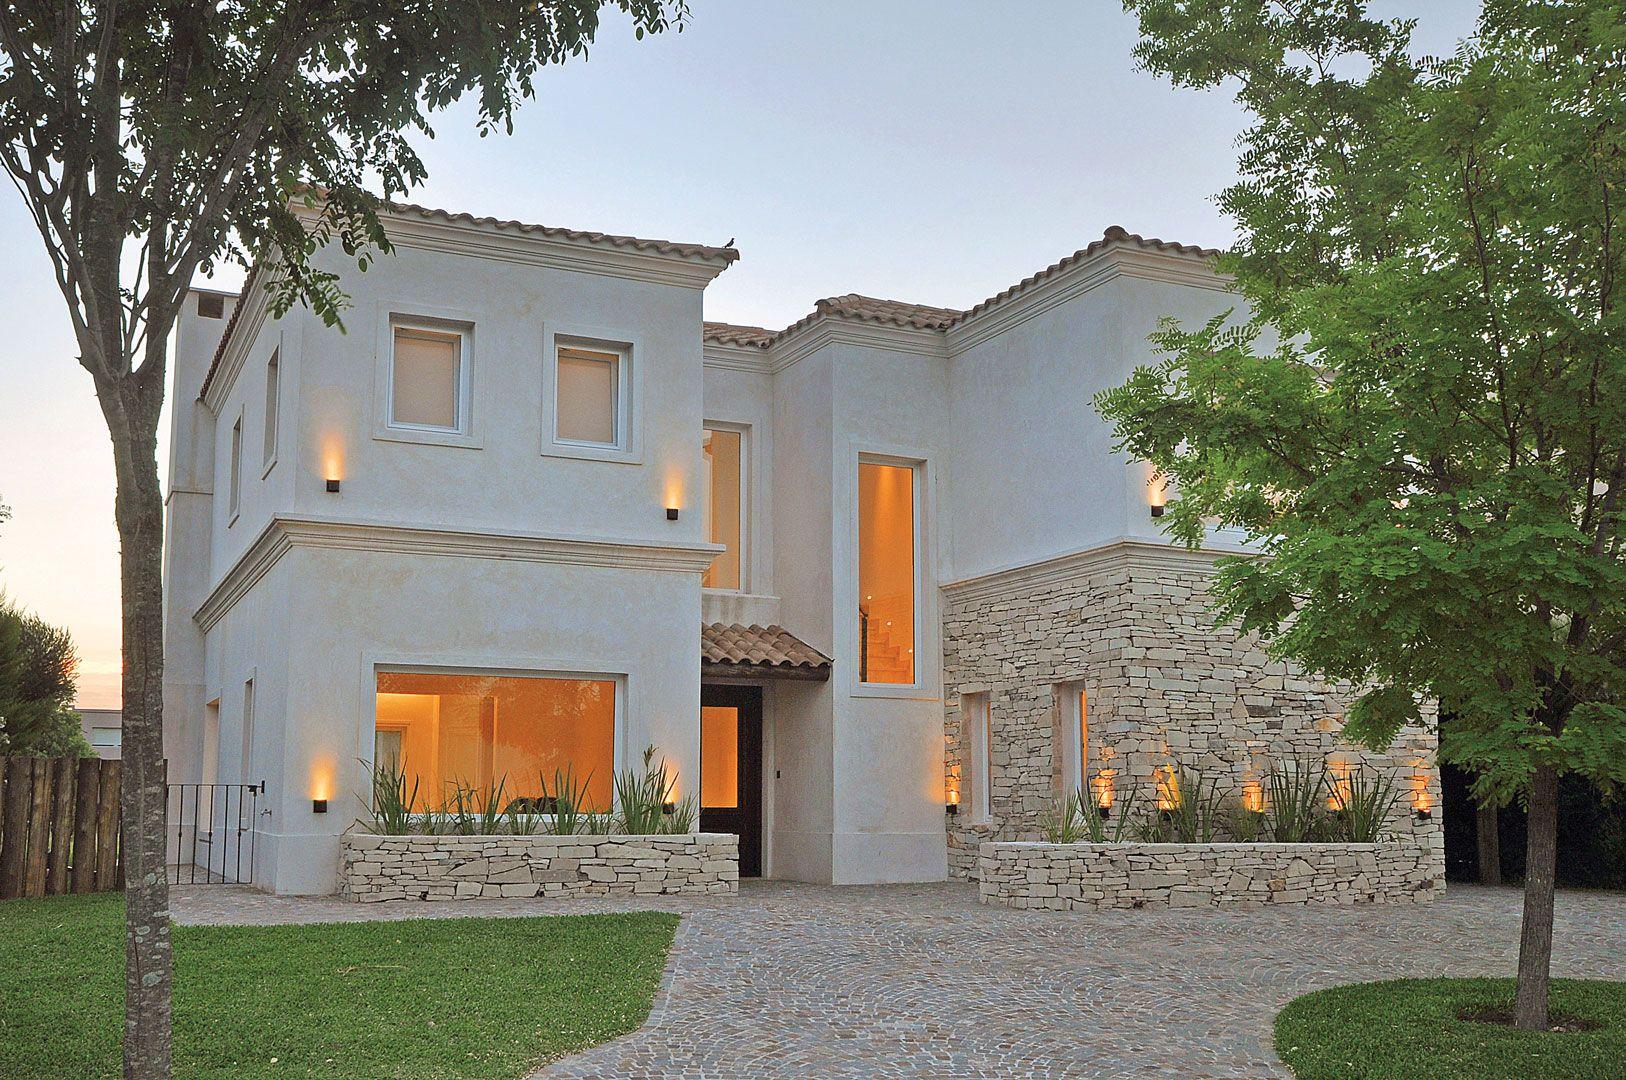 Arquitecto daniel tarrio y asociados casas piedras for Fachadas de casas modernas en italia